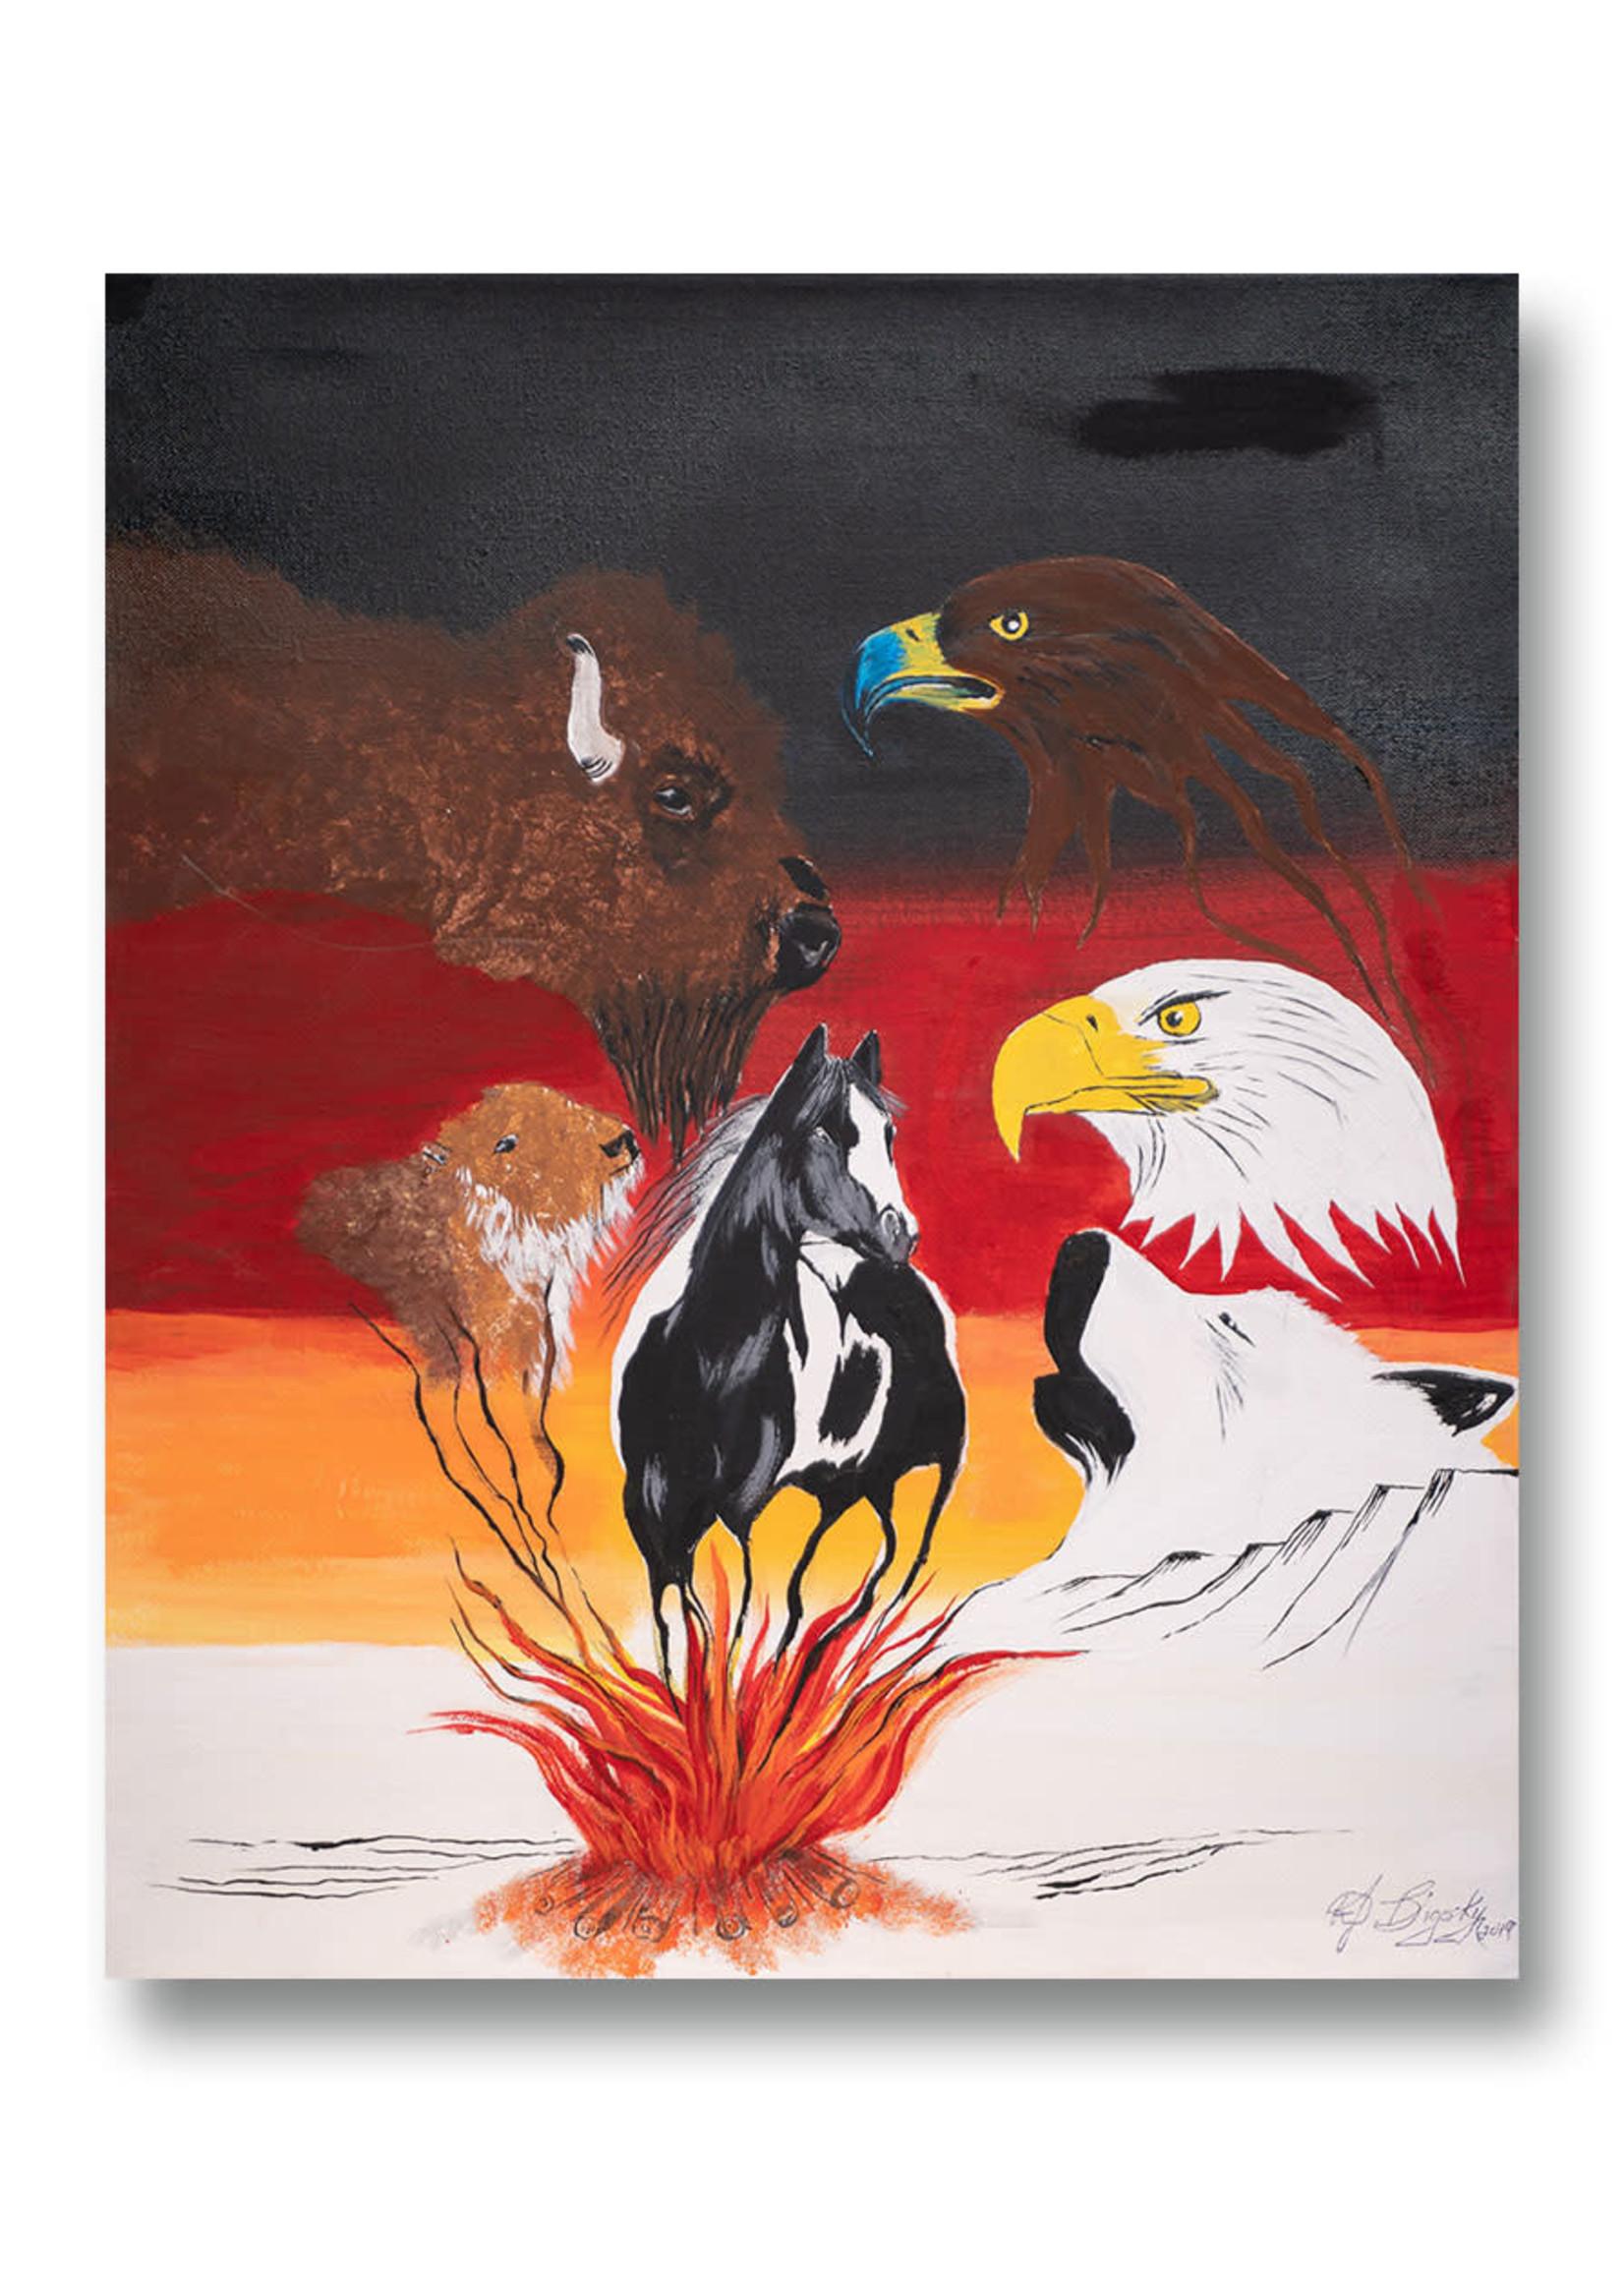 Spirit Animals In Sacred Fire (SOLD)